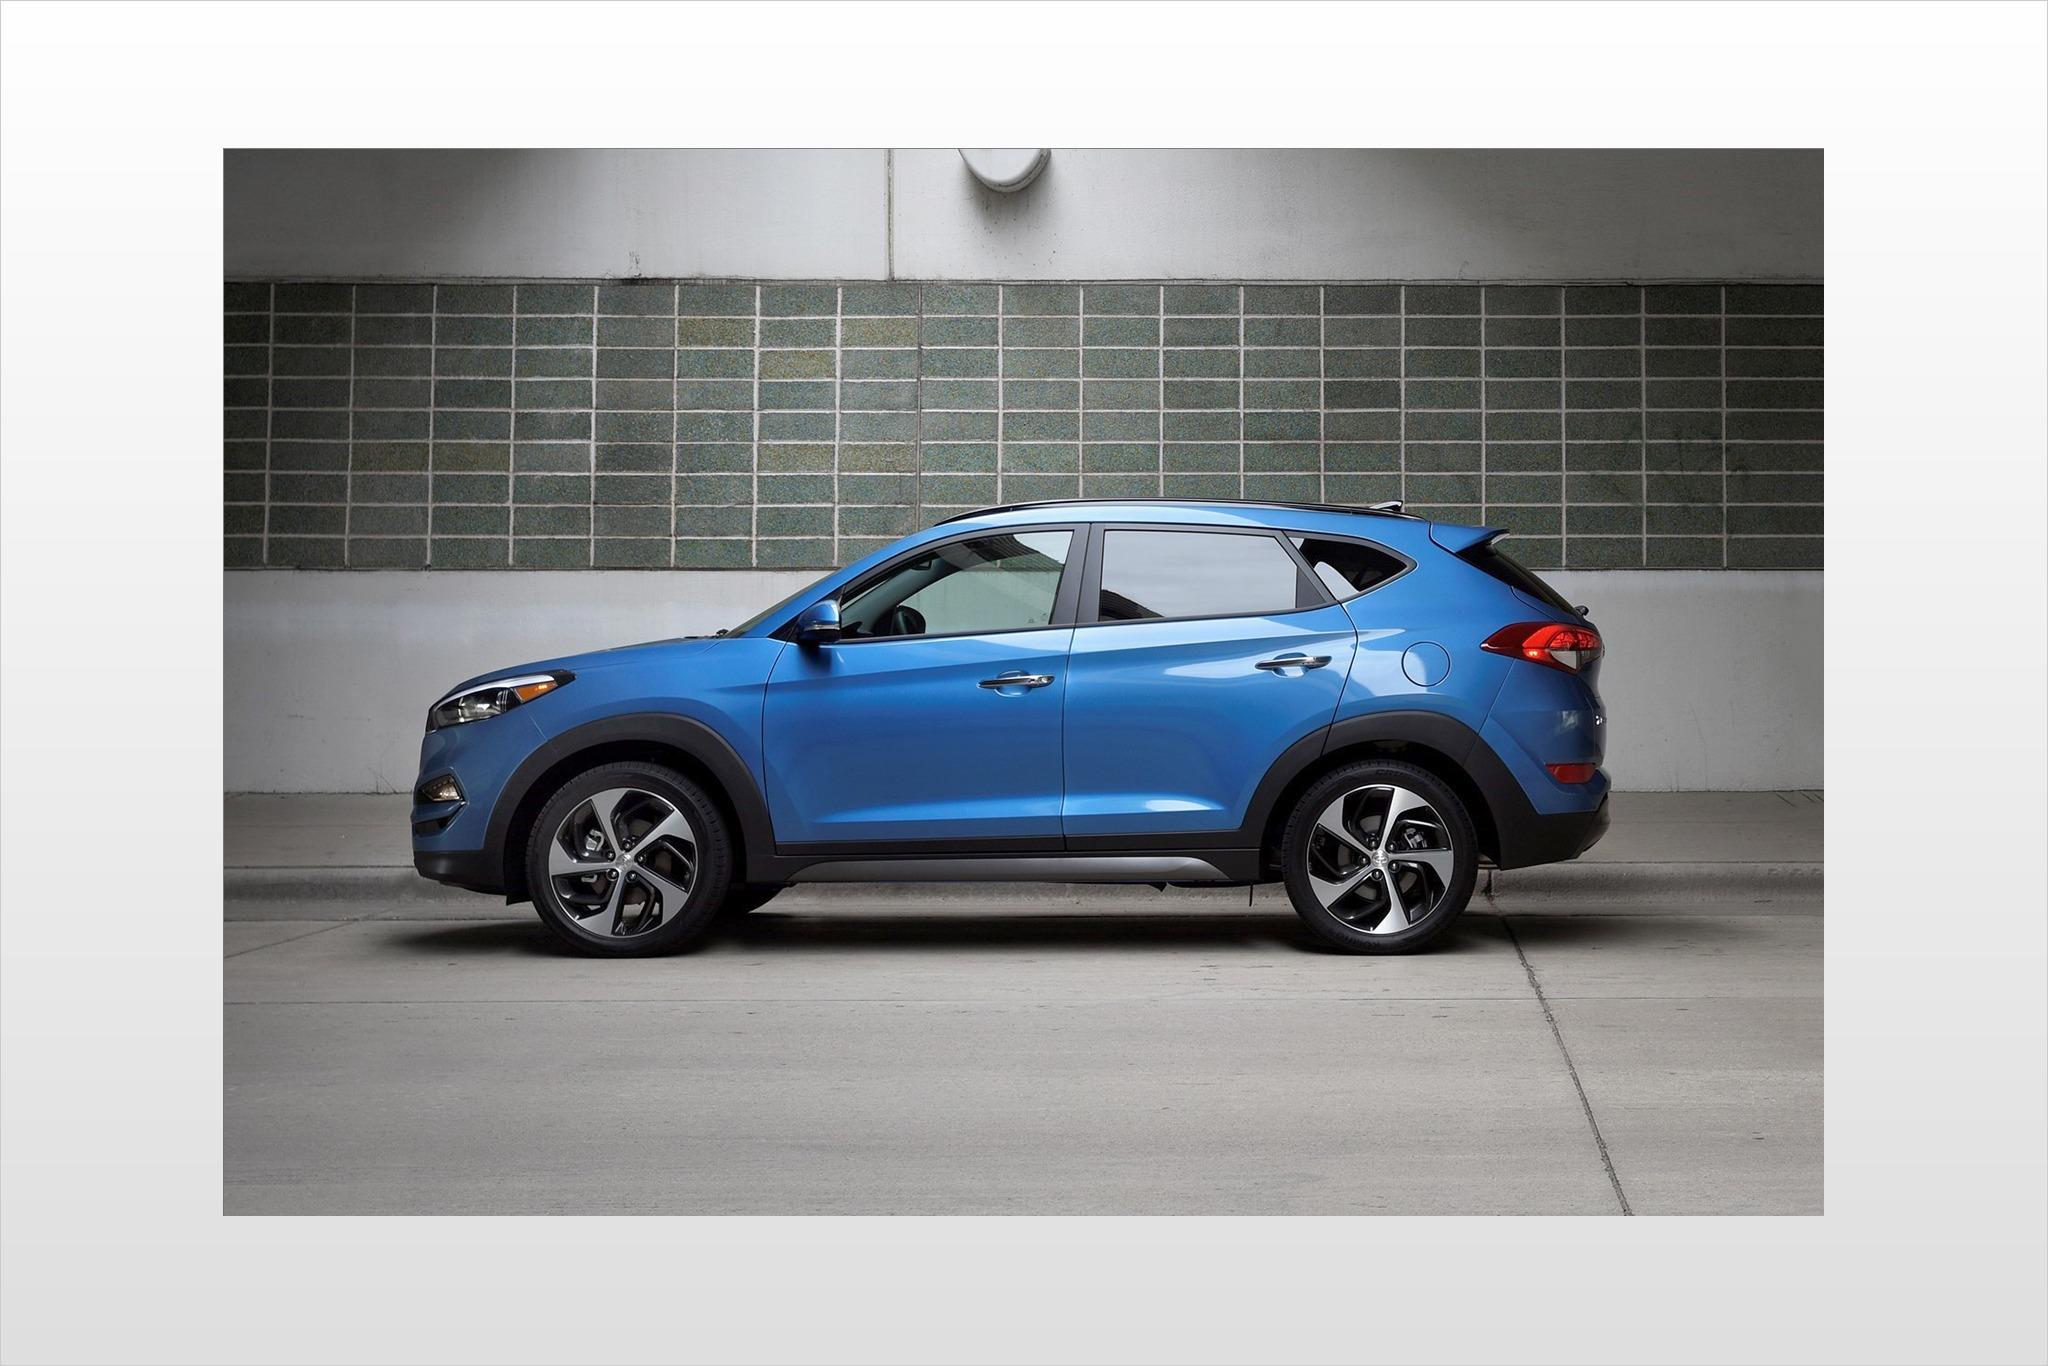 2017 Hyundai Tucson Vin Check  Specs  U0026 Recalls